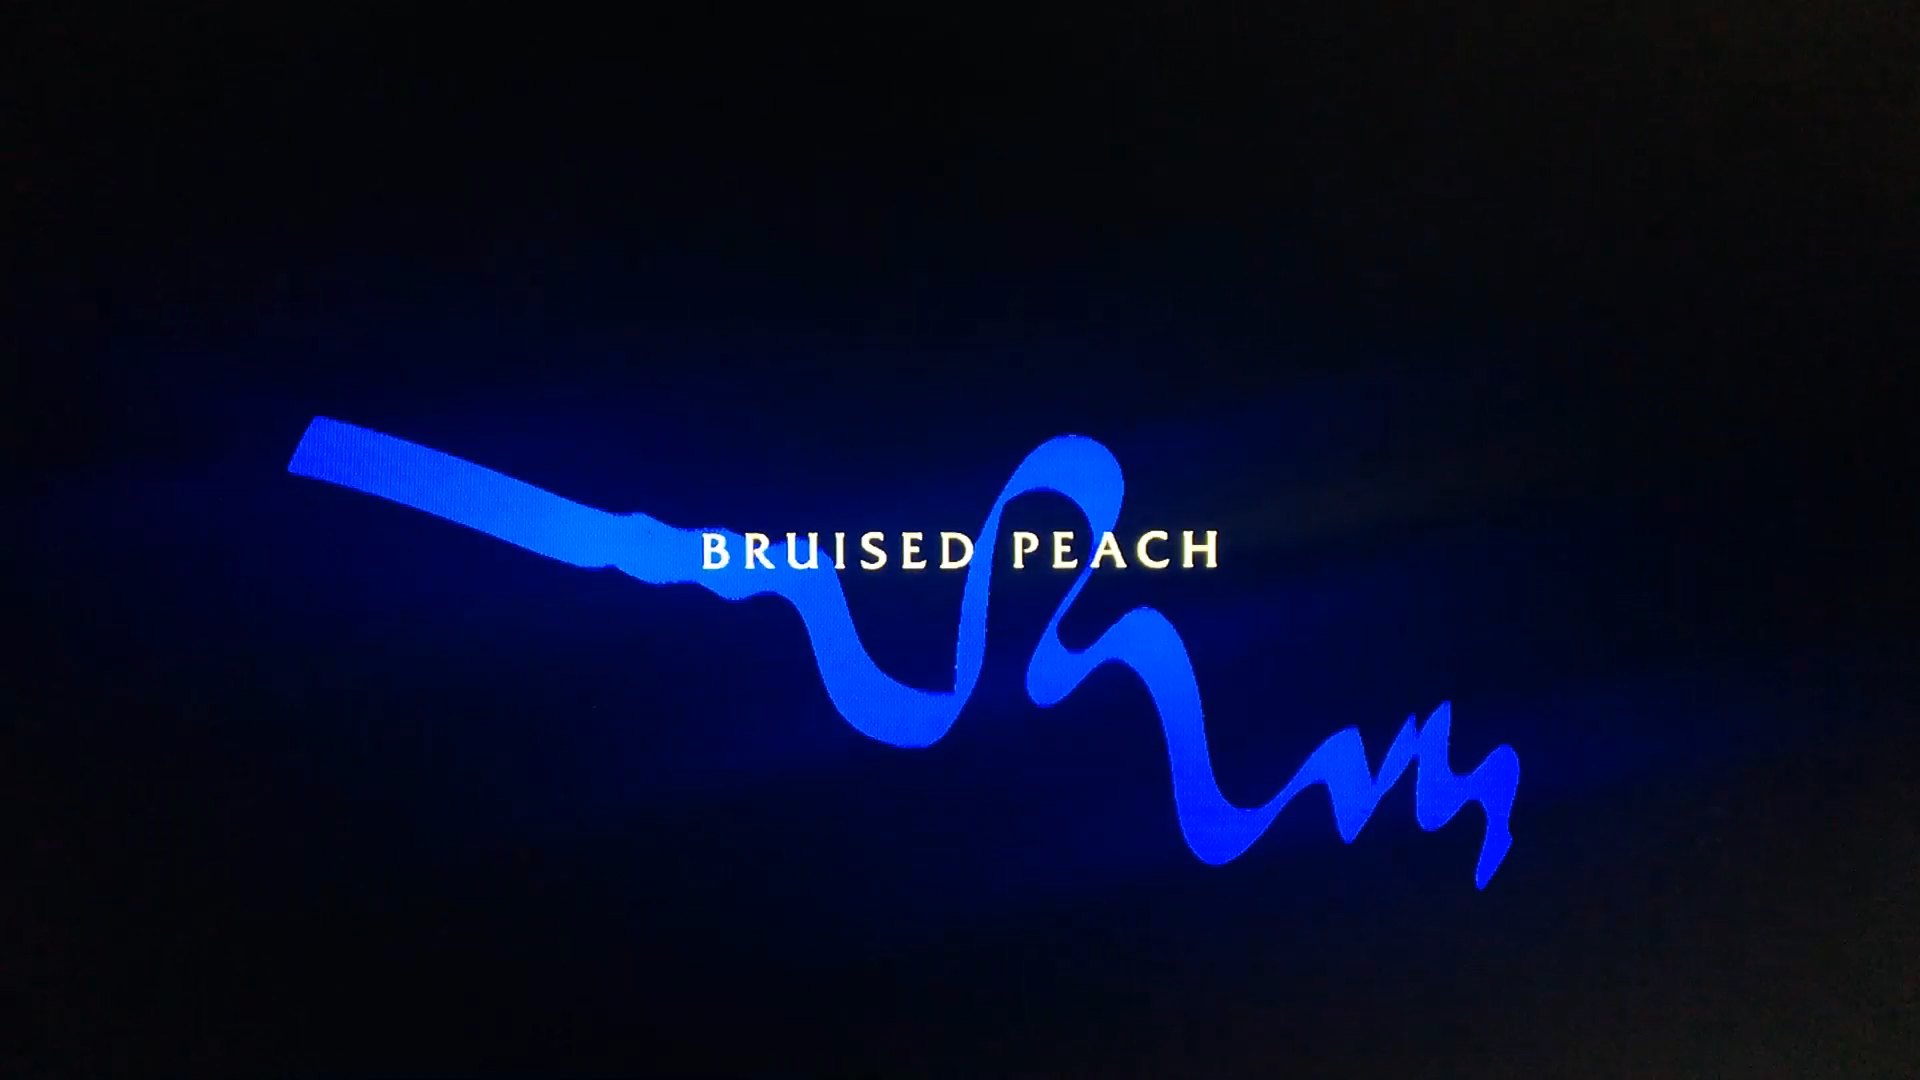 BruisedPeachREFIX (0-00-11-10).jpg